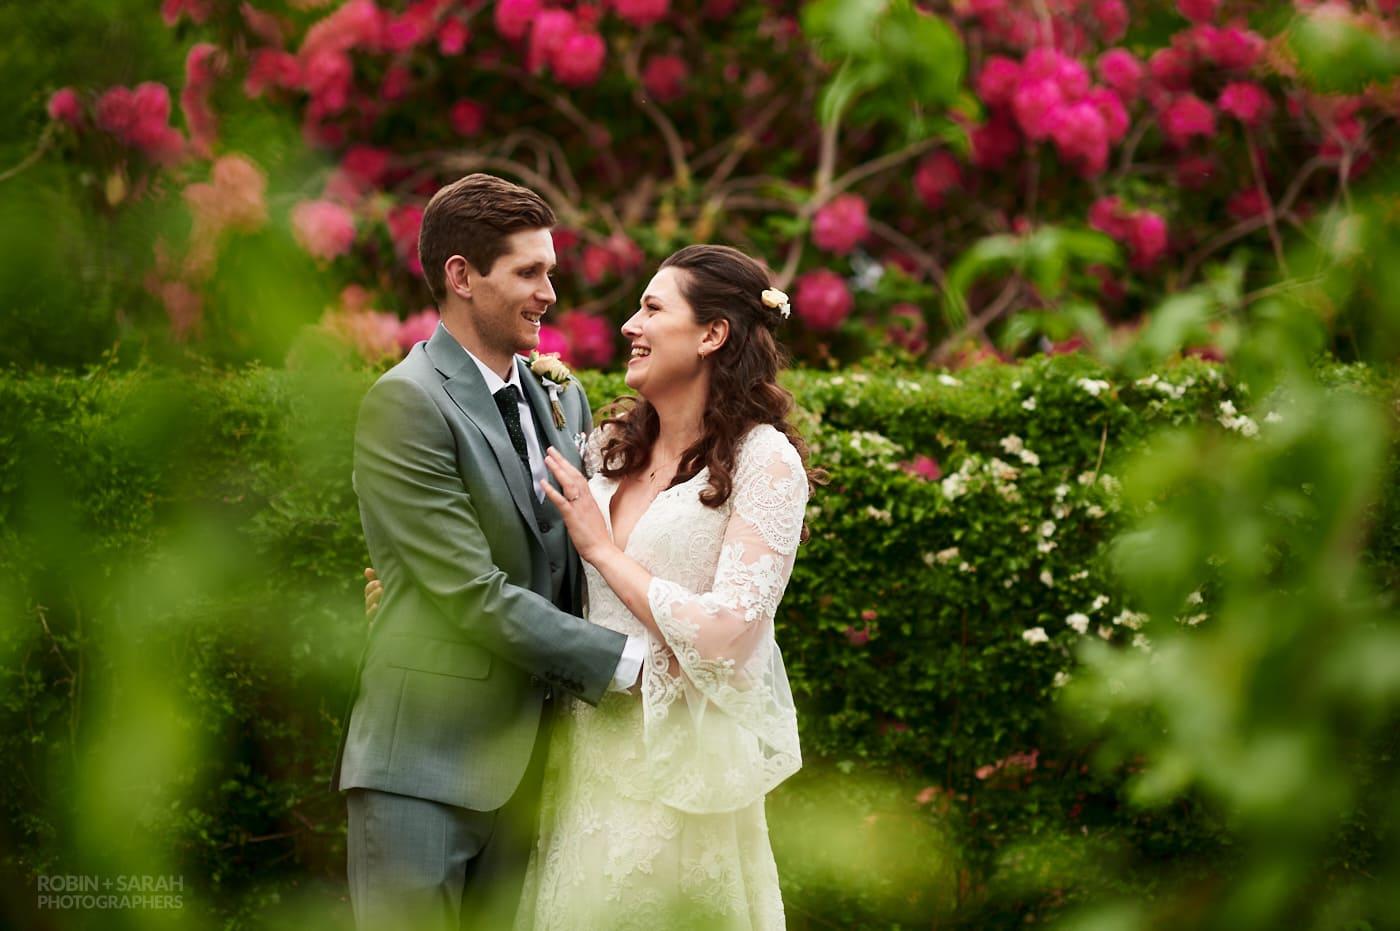 Bride and groom relaxing in garden during evening